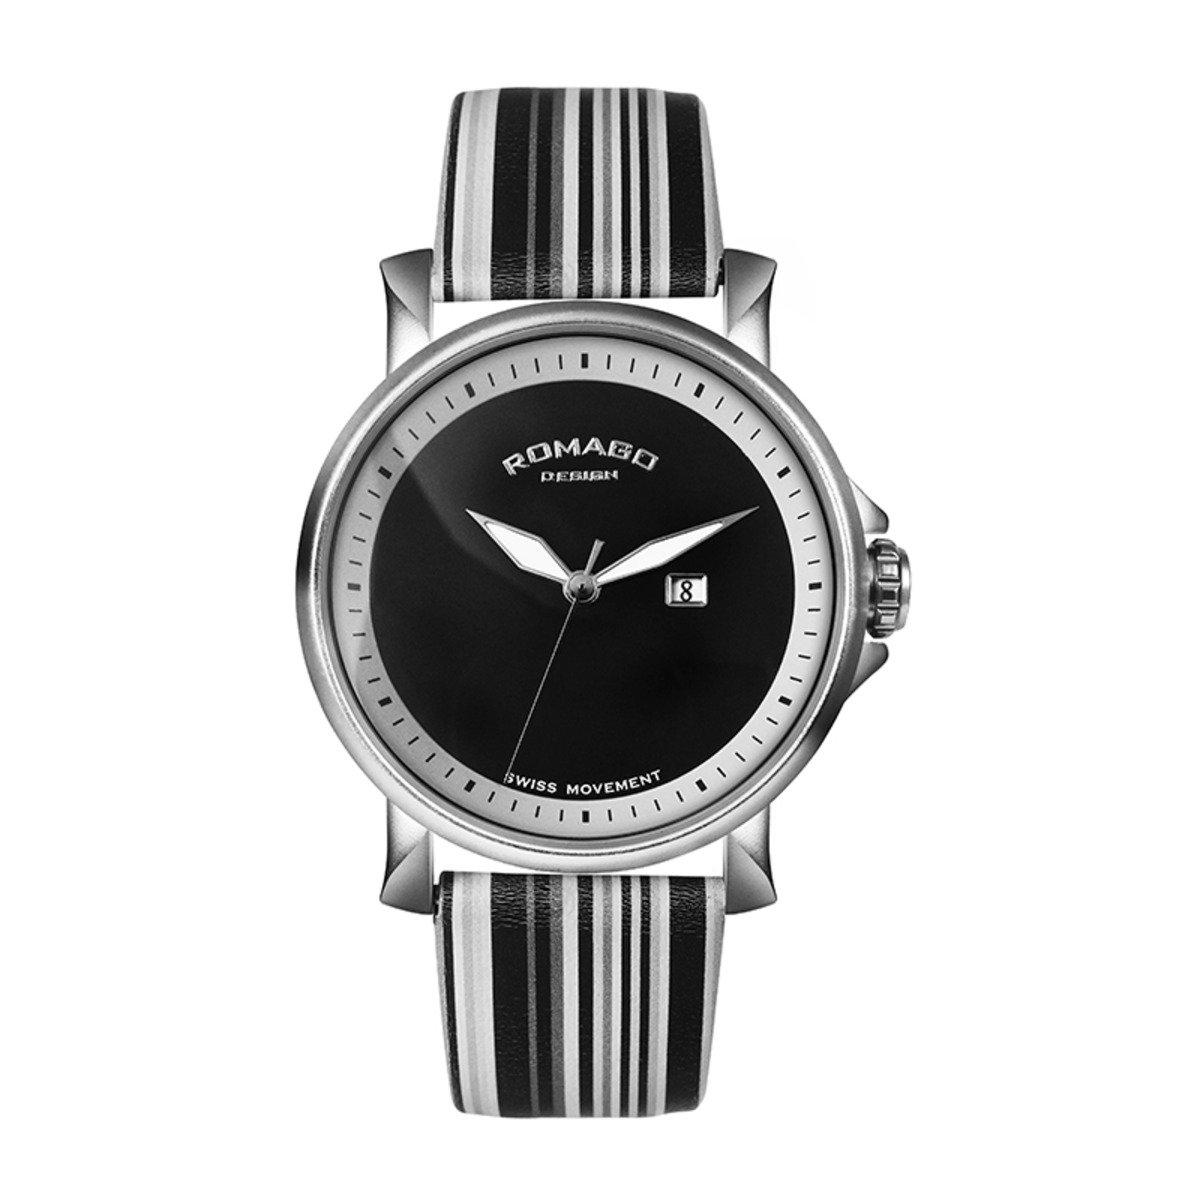 Interchangeable strap set Watch